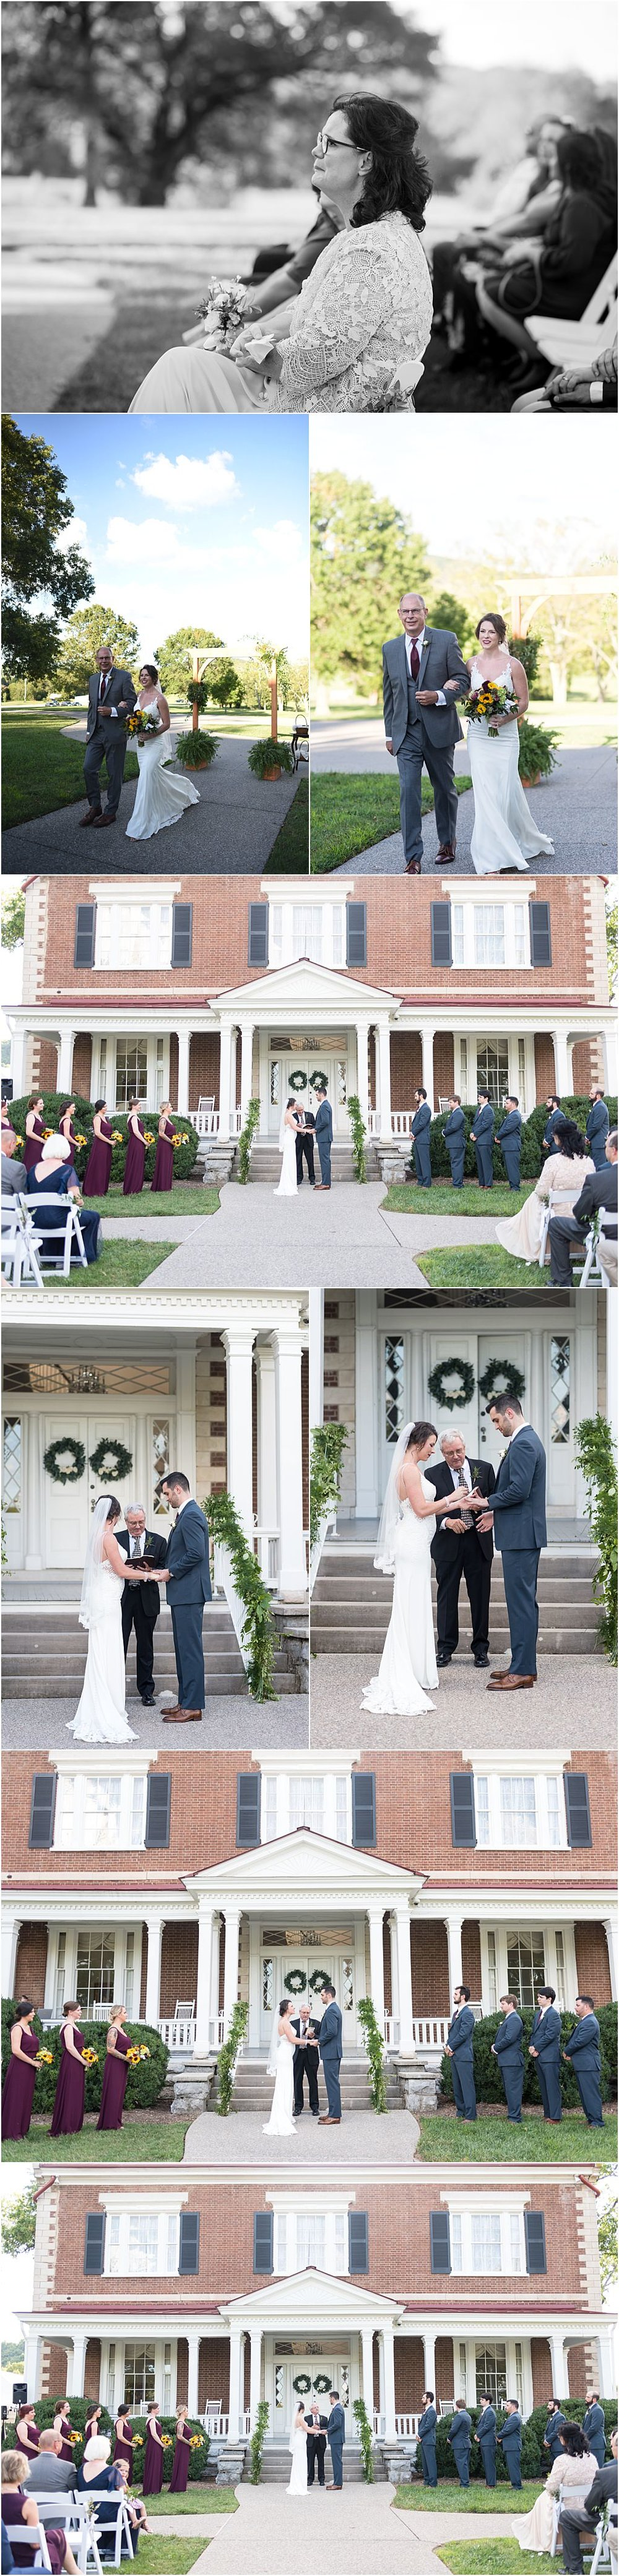 Jordan-and-Anna-Ravenswood-Mansion-Wedding-in-Brentwood-TN-Nashville-Wedding-Photographers+6